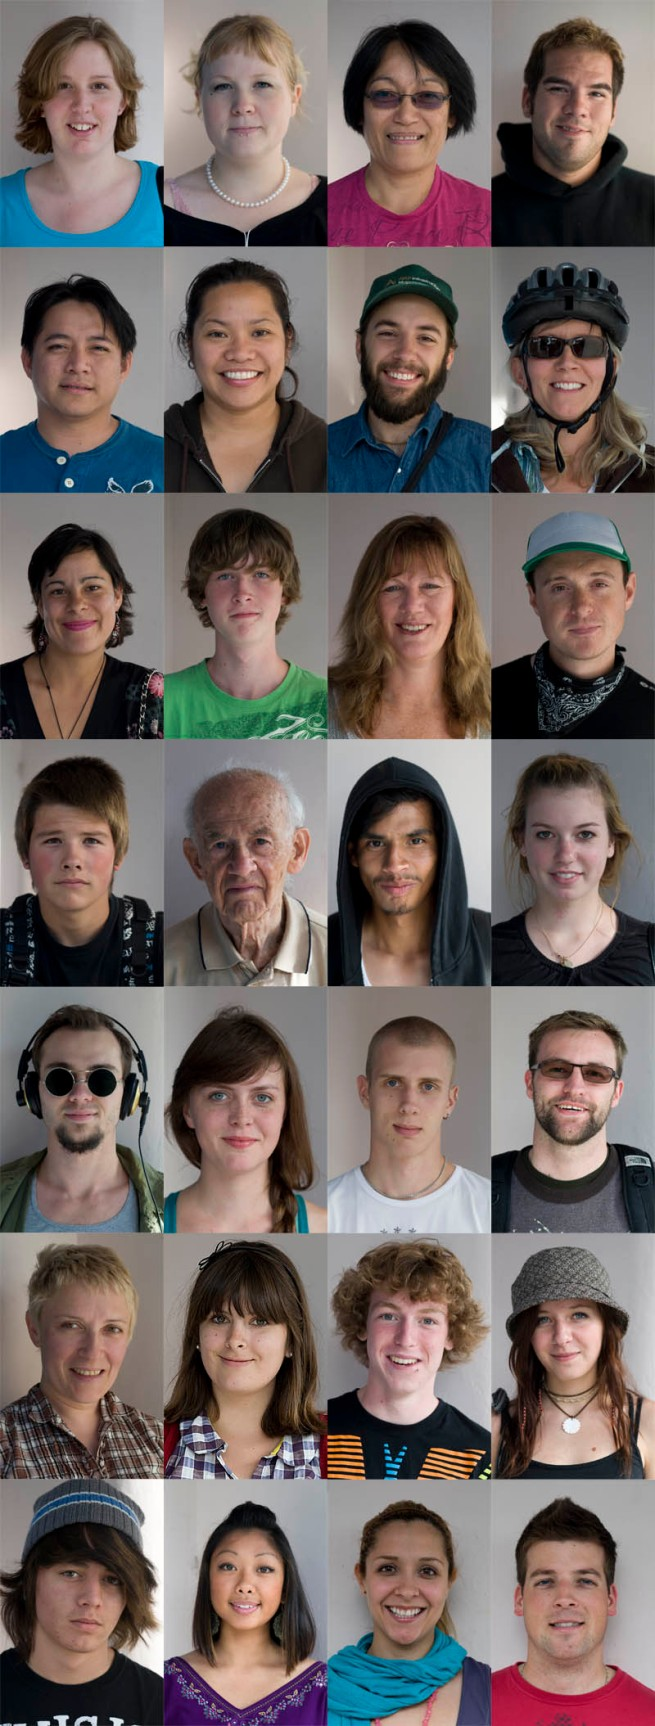 saskatoon faces _3.